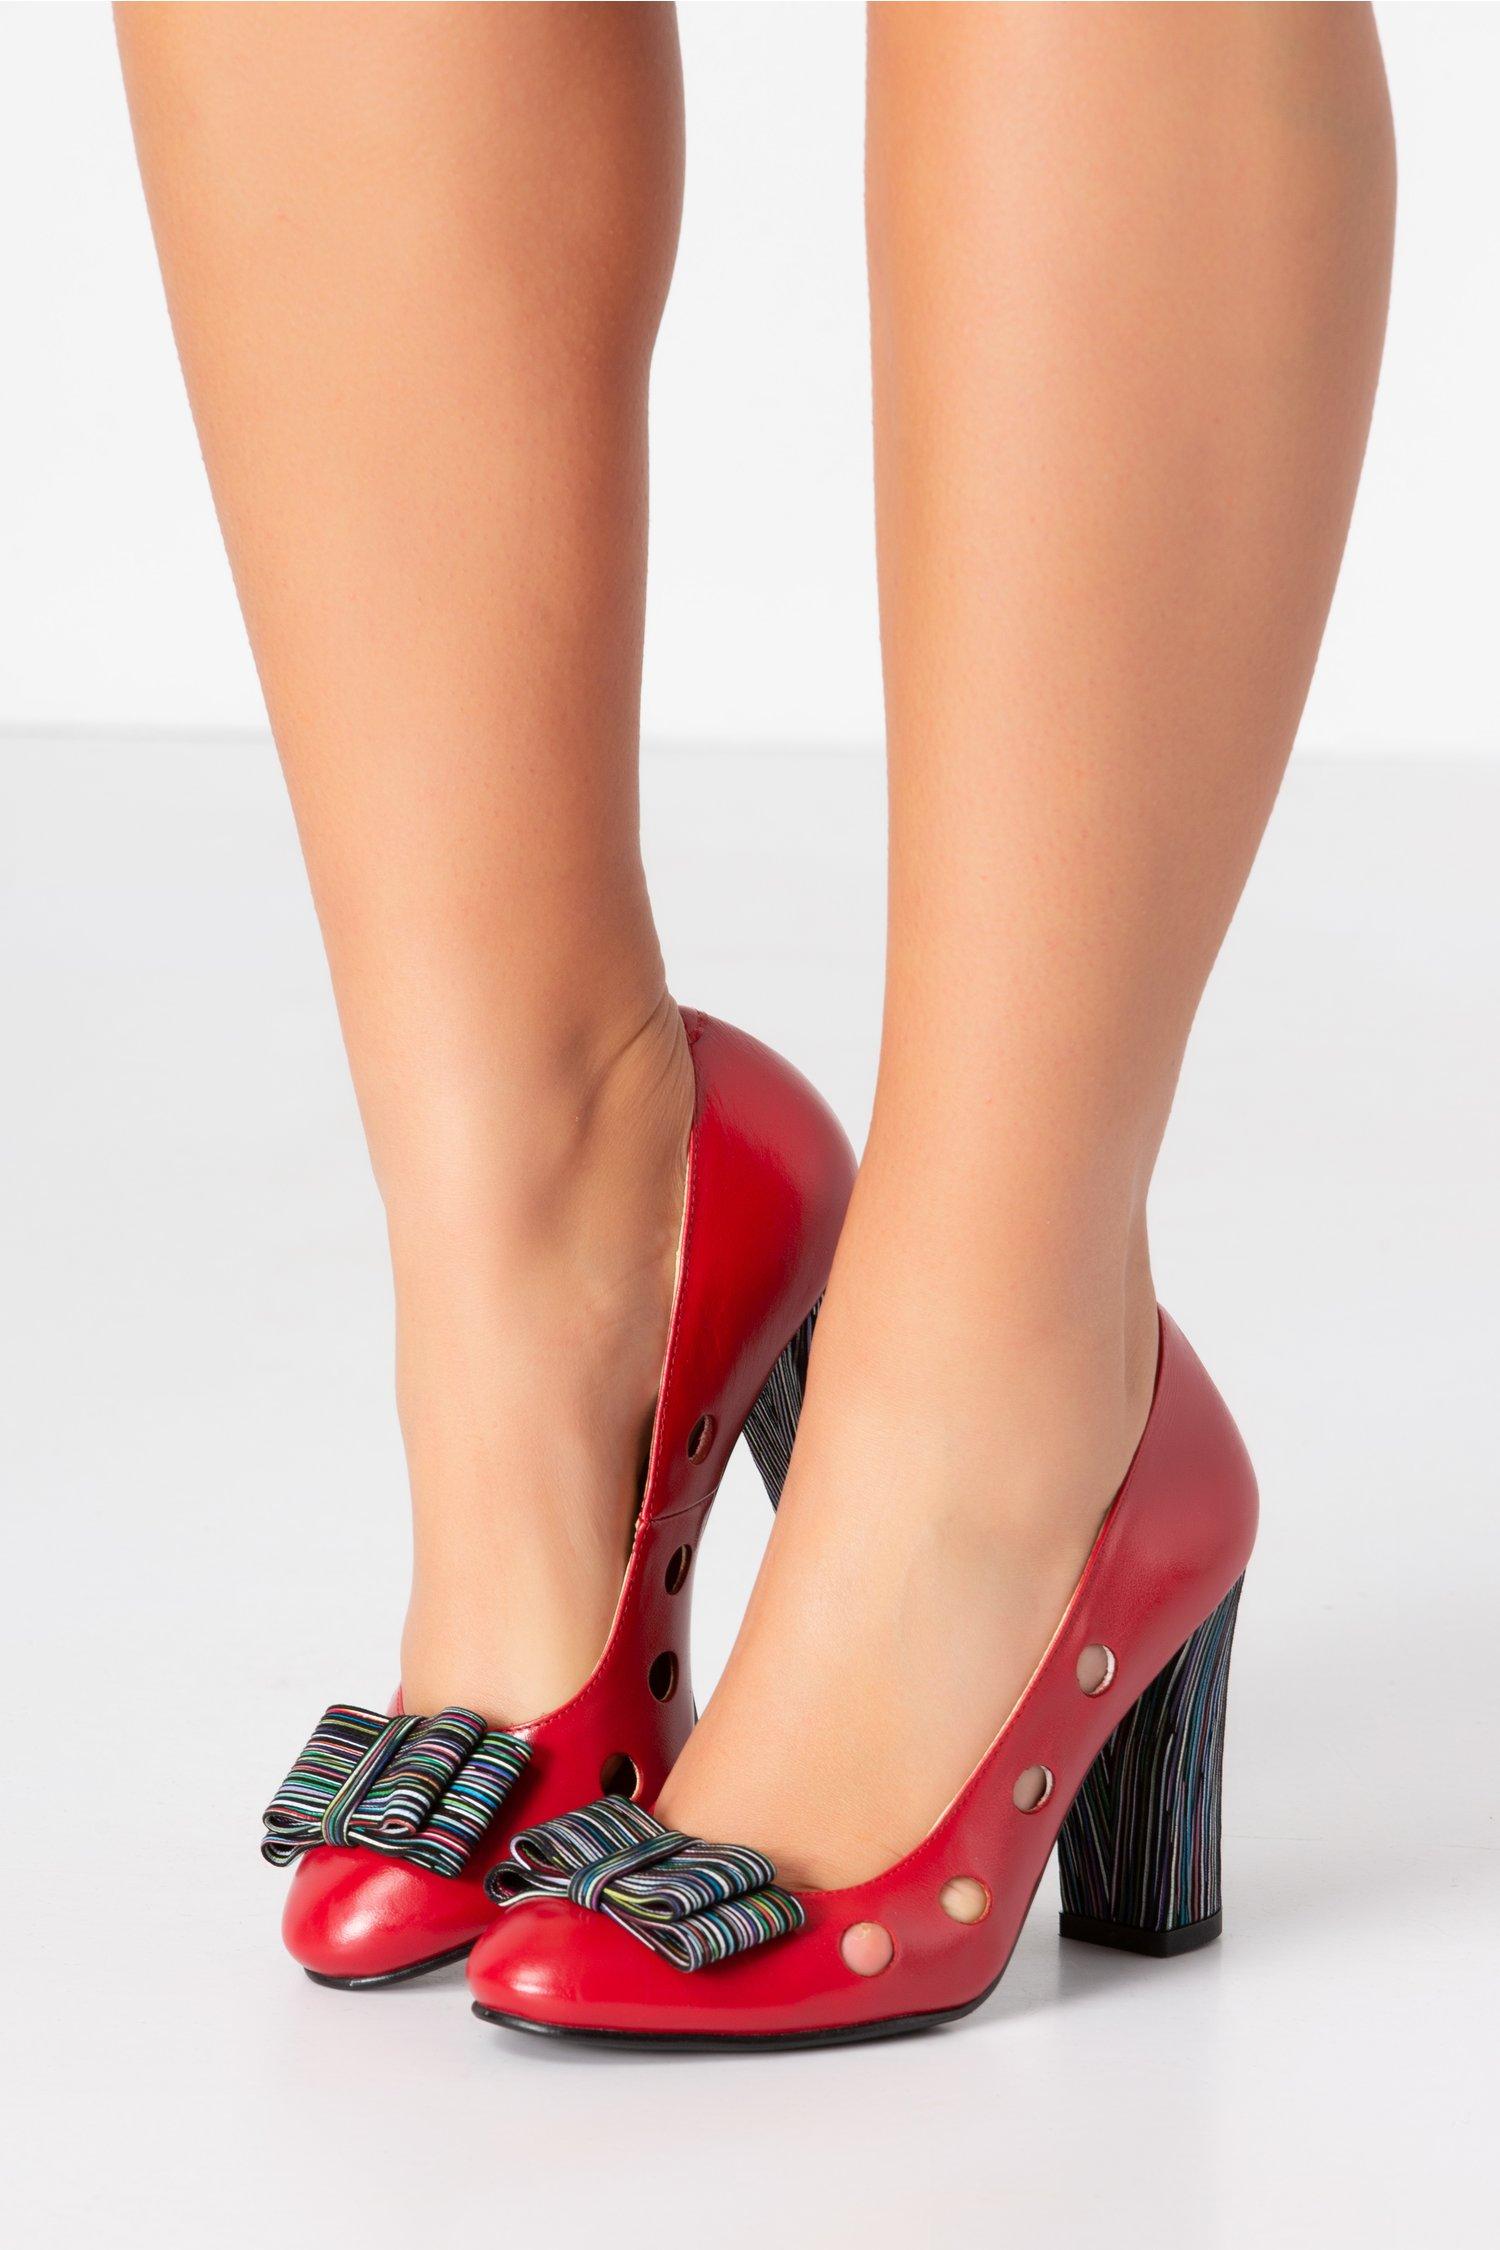 Pantofi rosii cu perforatii si dungi